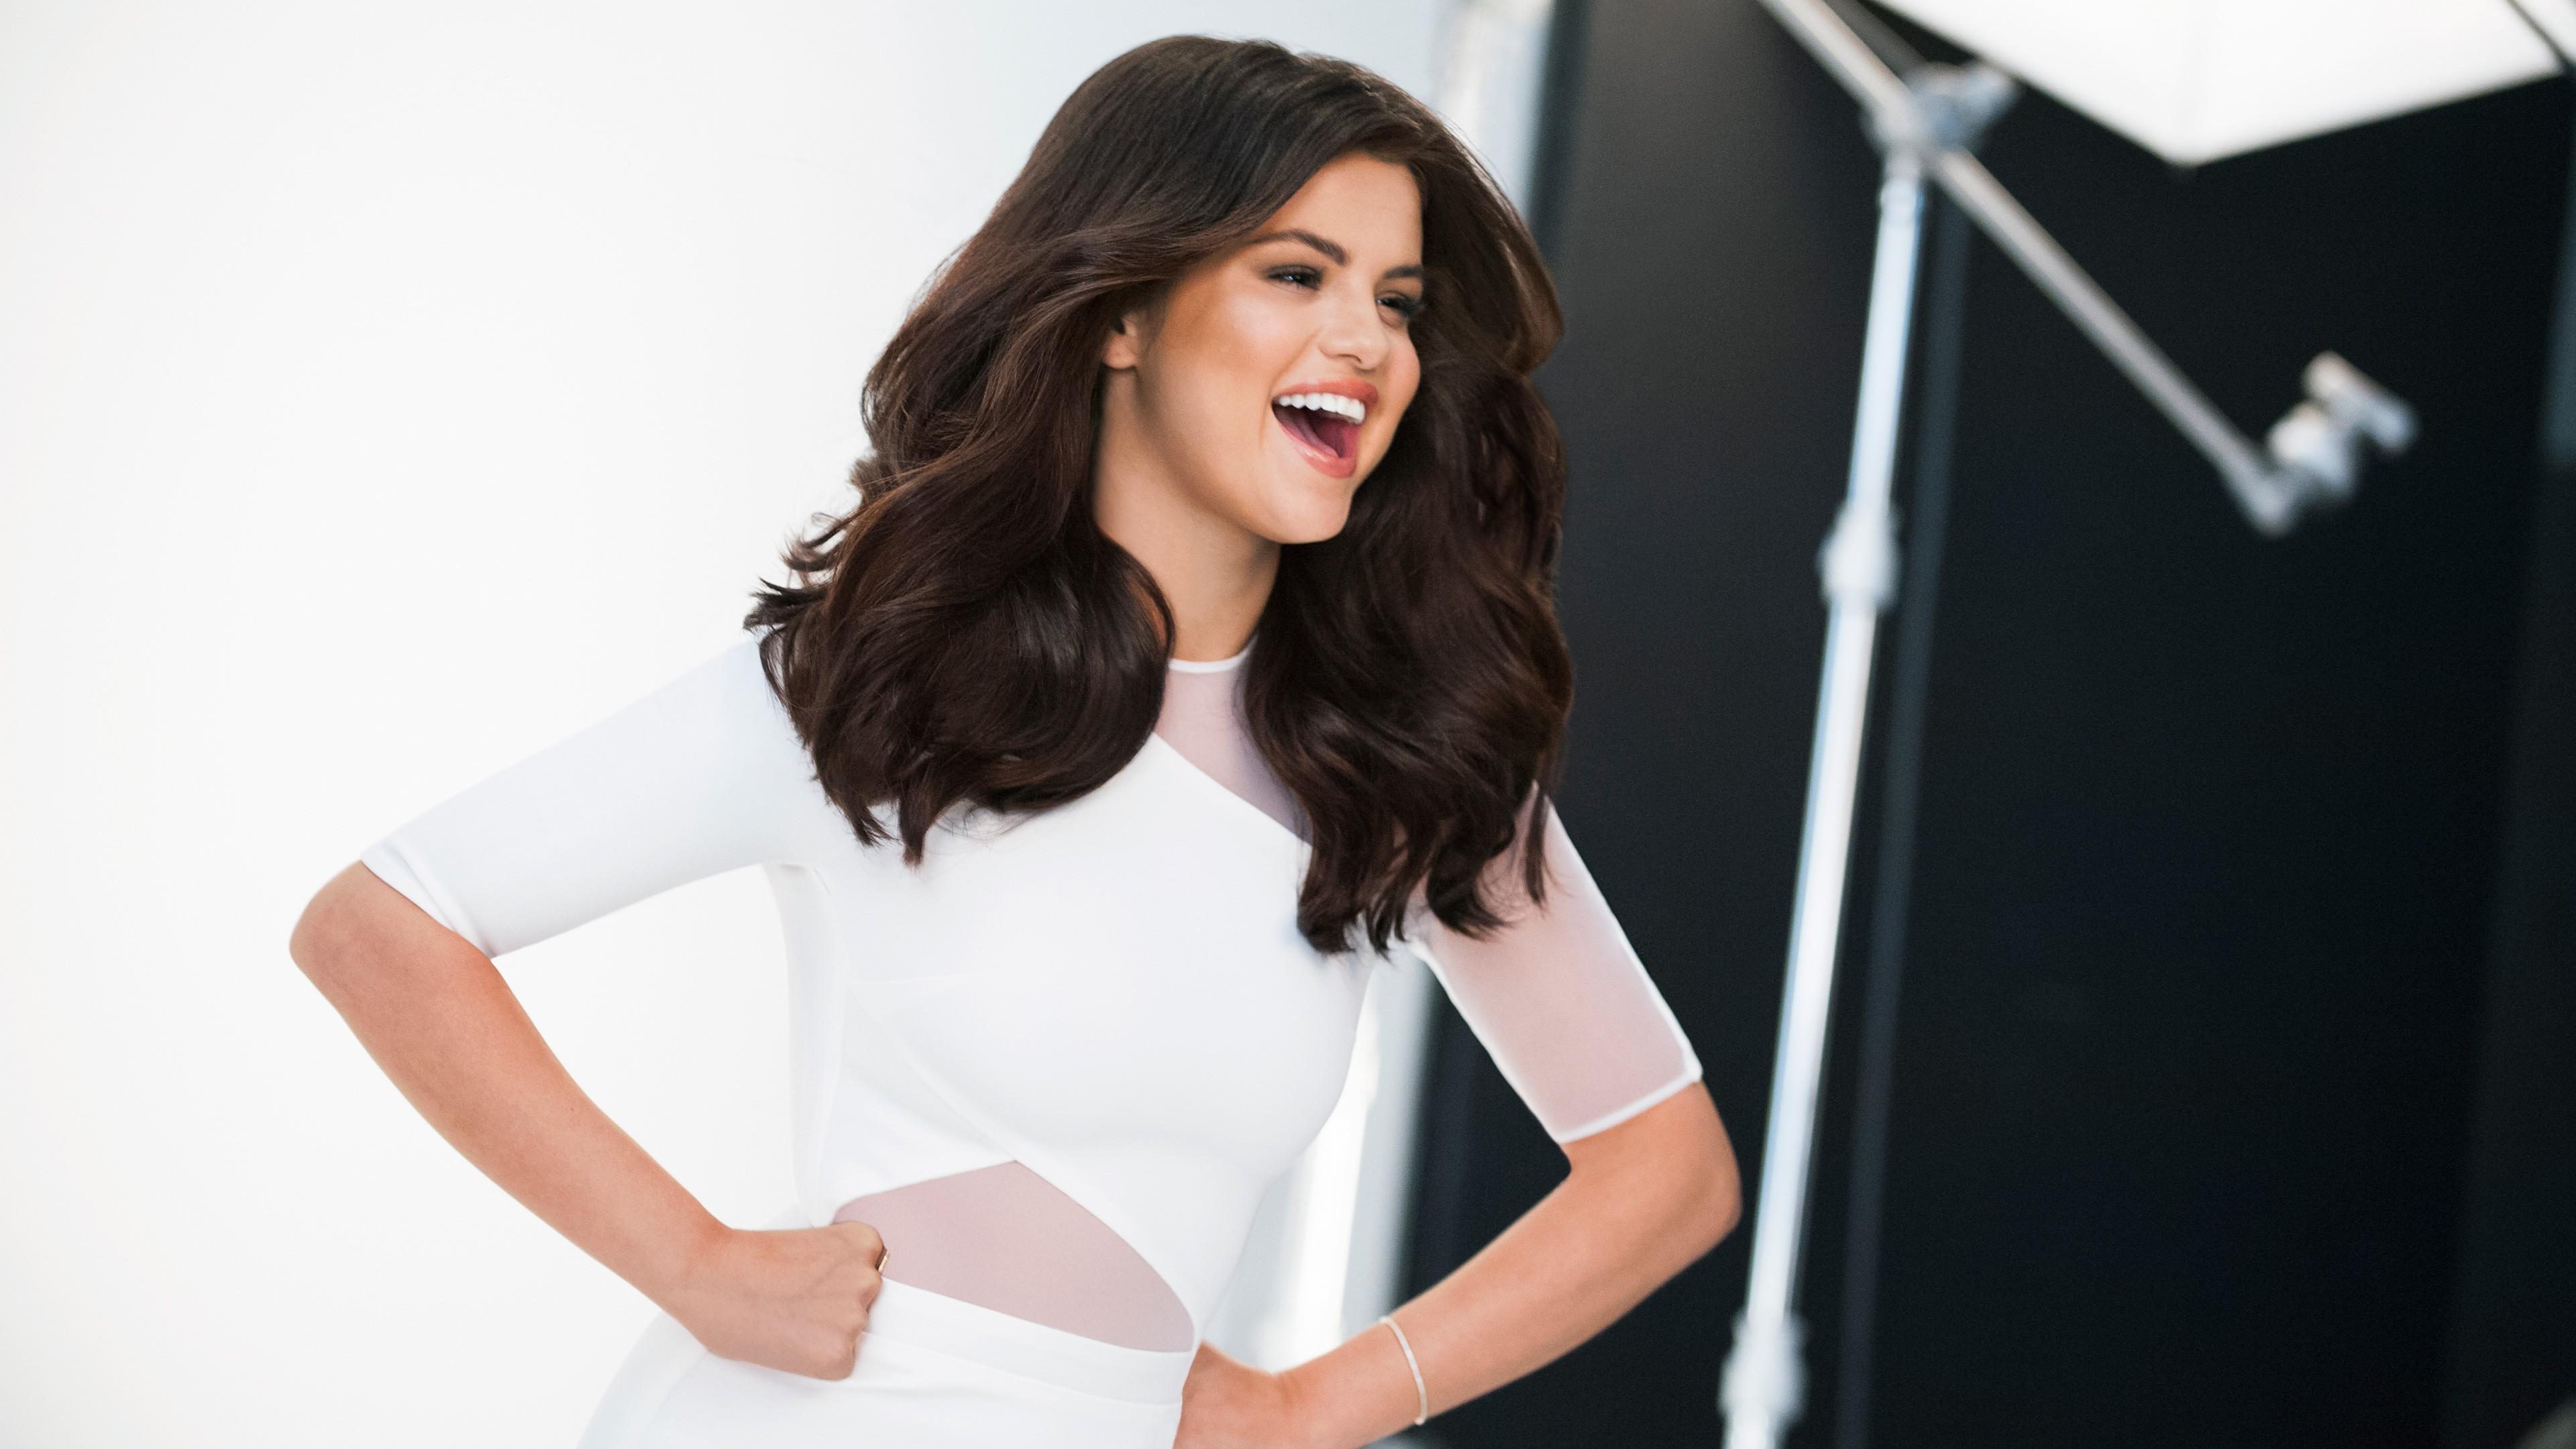 selena gomez 10 1536855773 - Selena Gomez 10 - selena gomez wallpapers, music wallpapers, girls wallpapers, celebrities wallpapers